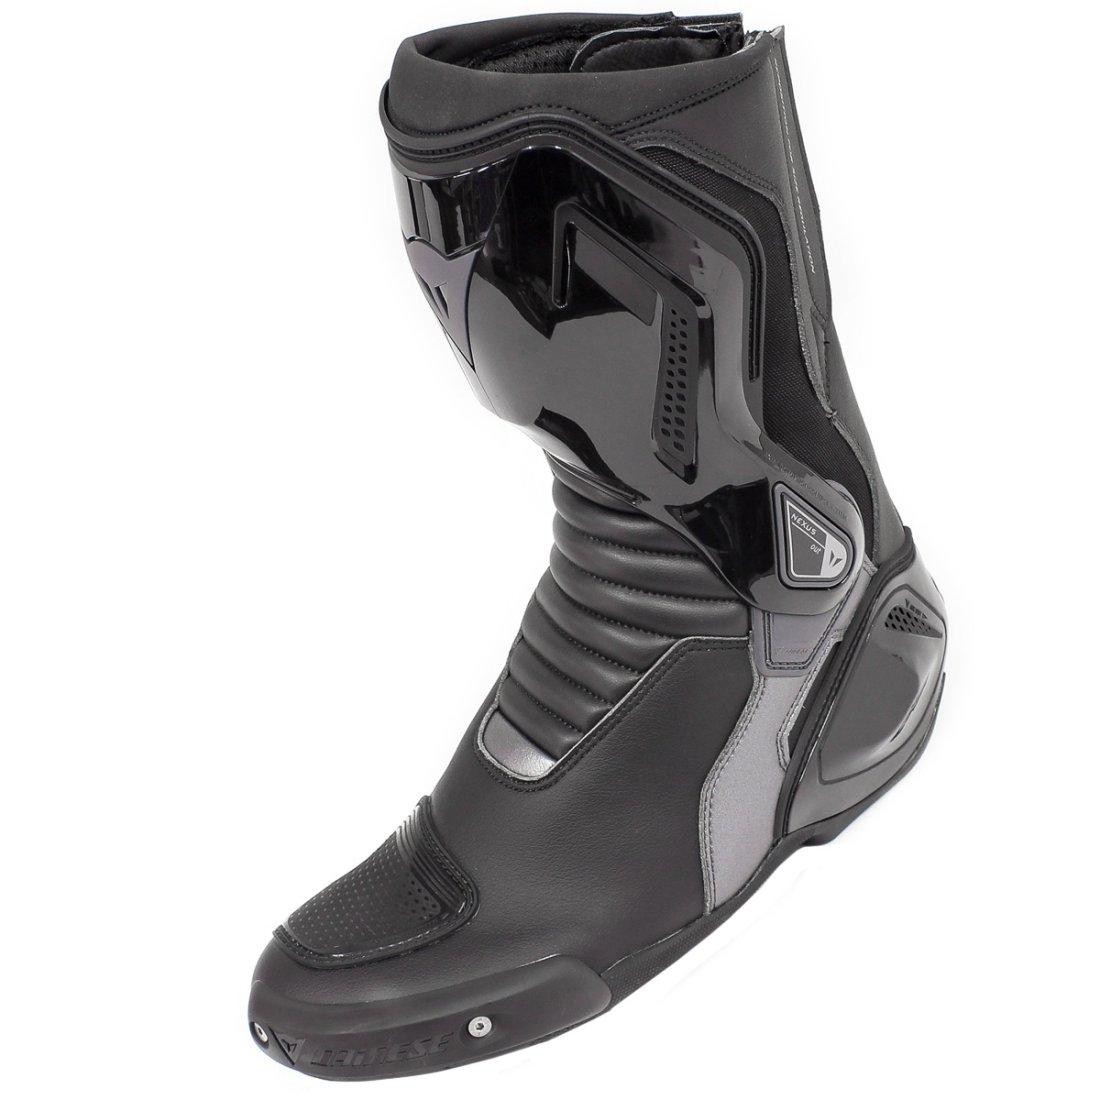 DAINESE Nexus Black / Anthracite Boots